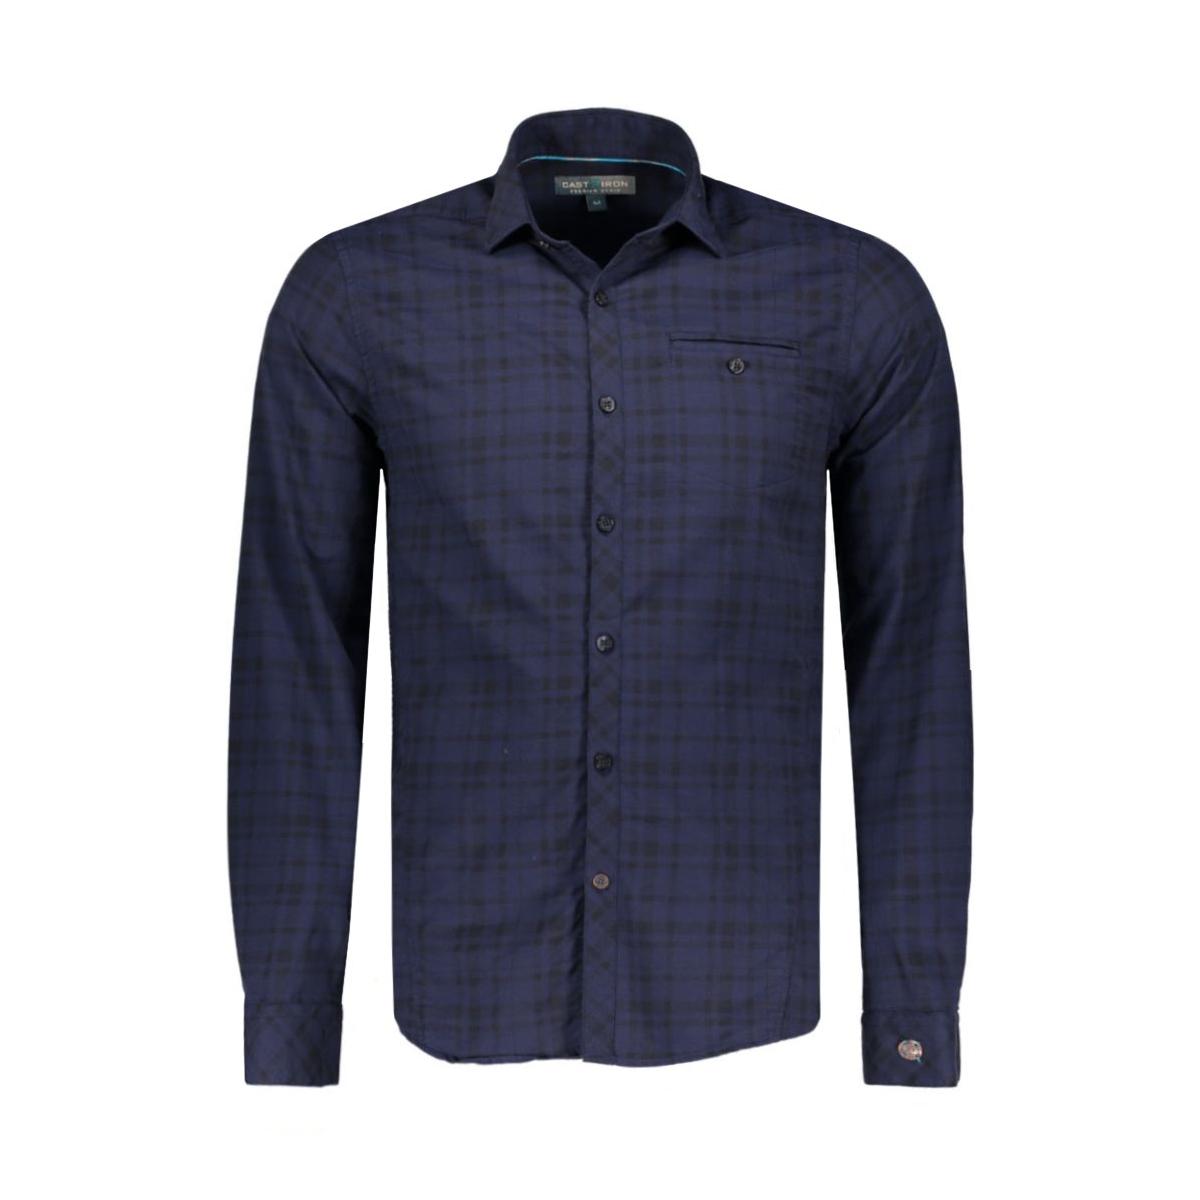 csi67602 cast iron overhemd 5073